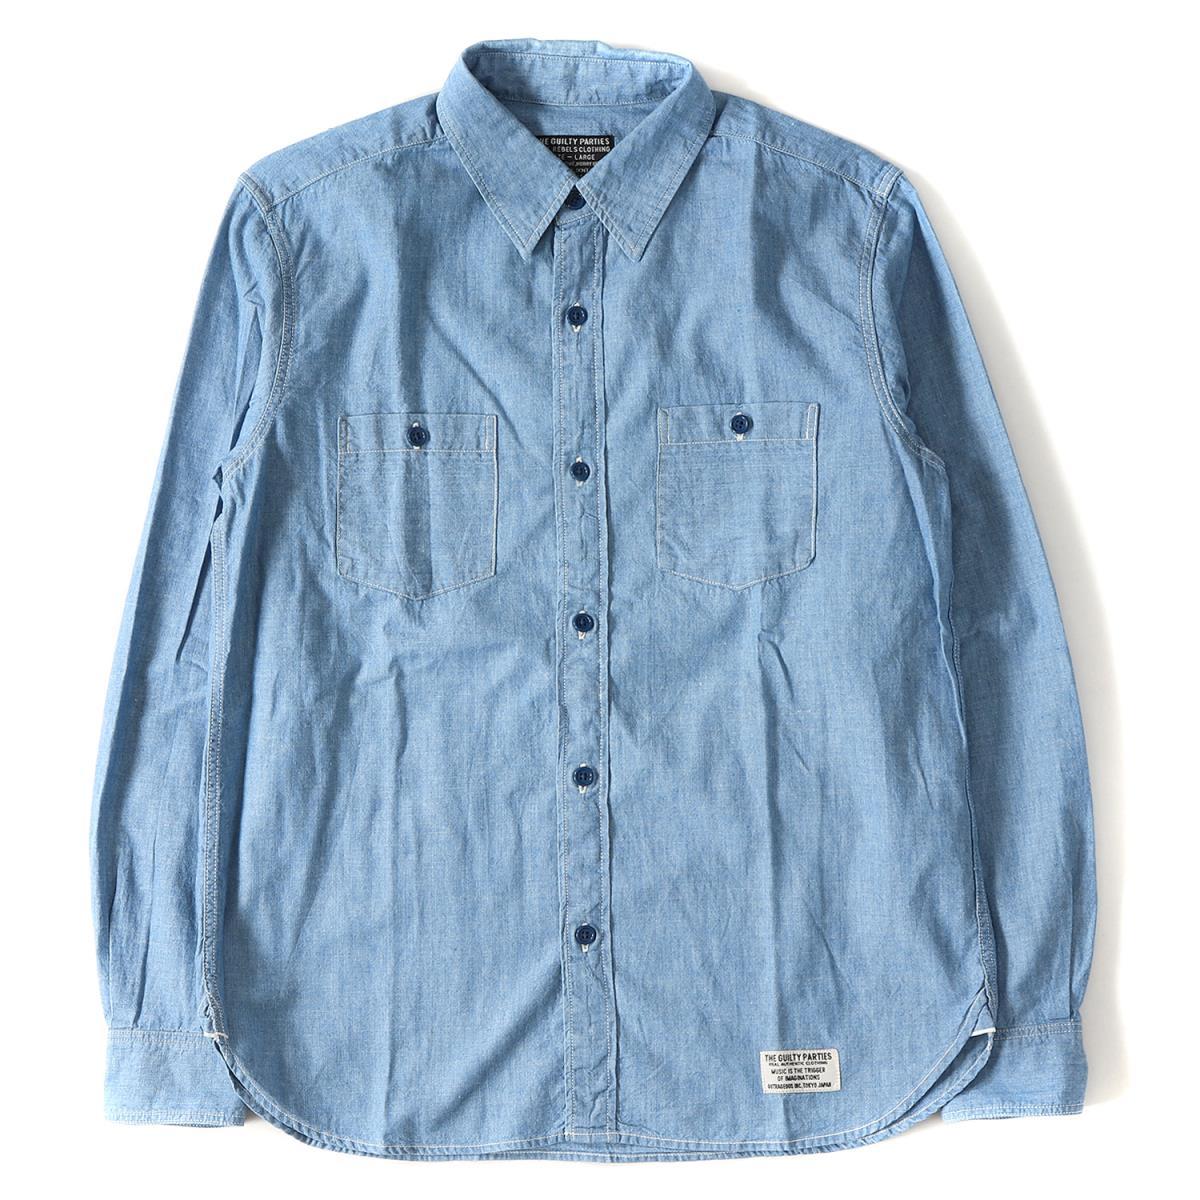 XiaoTianXinMen XTX Mens Linen Muslim Side Slit Classic Long Sleeve T-Shirts Tops